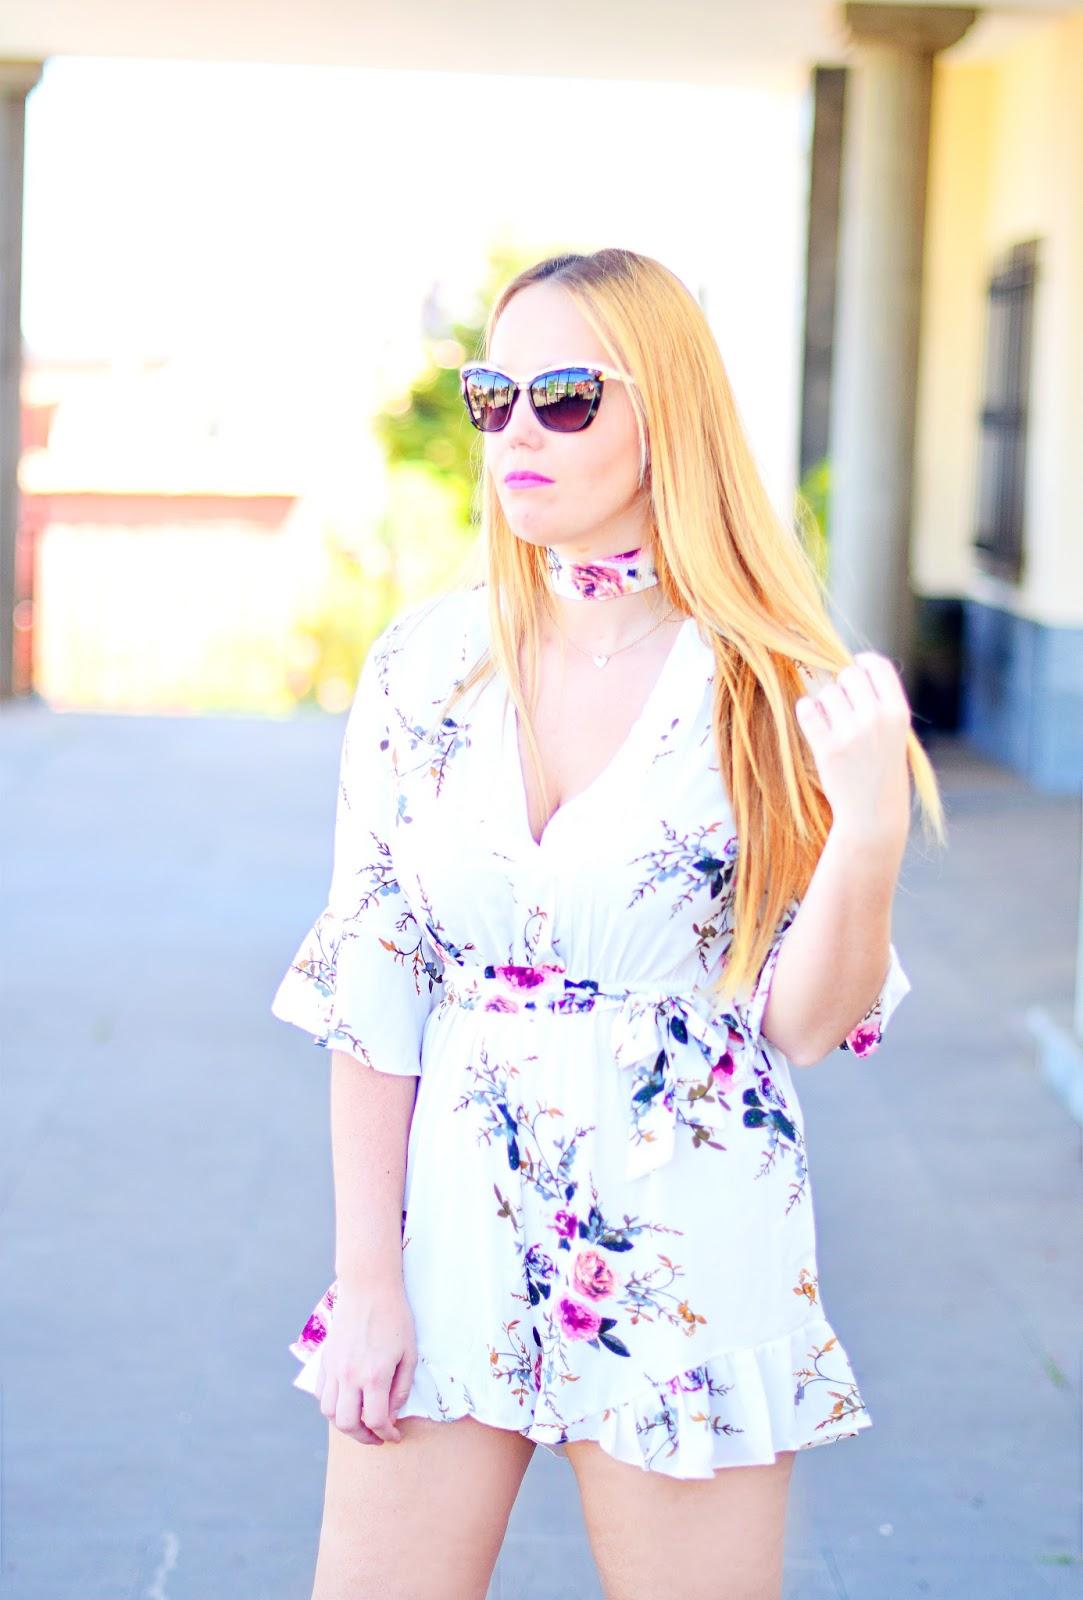 nery hdez, sammydress, opticalh, swarovski sunglasses, romper with choker, floral print